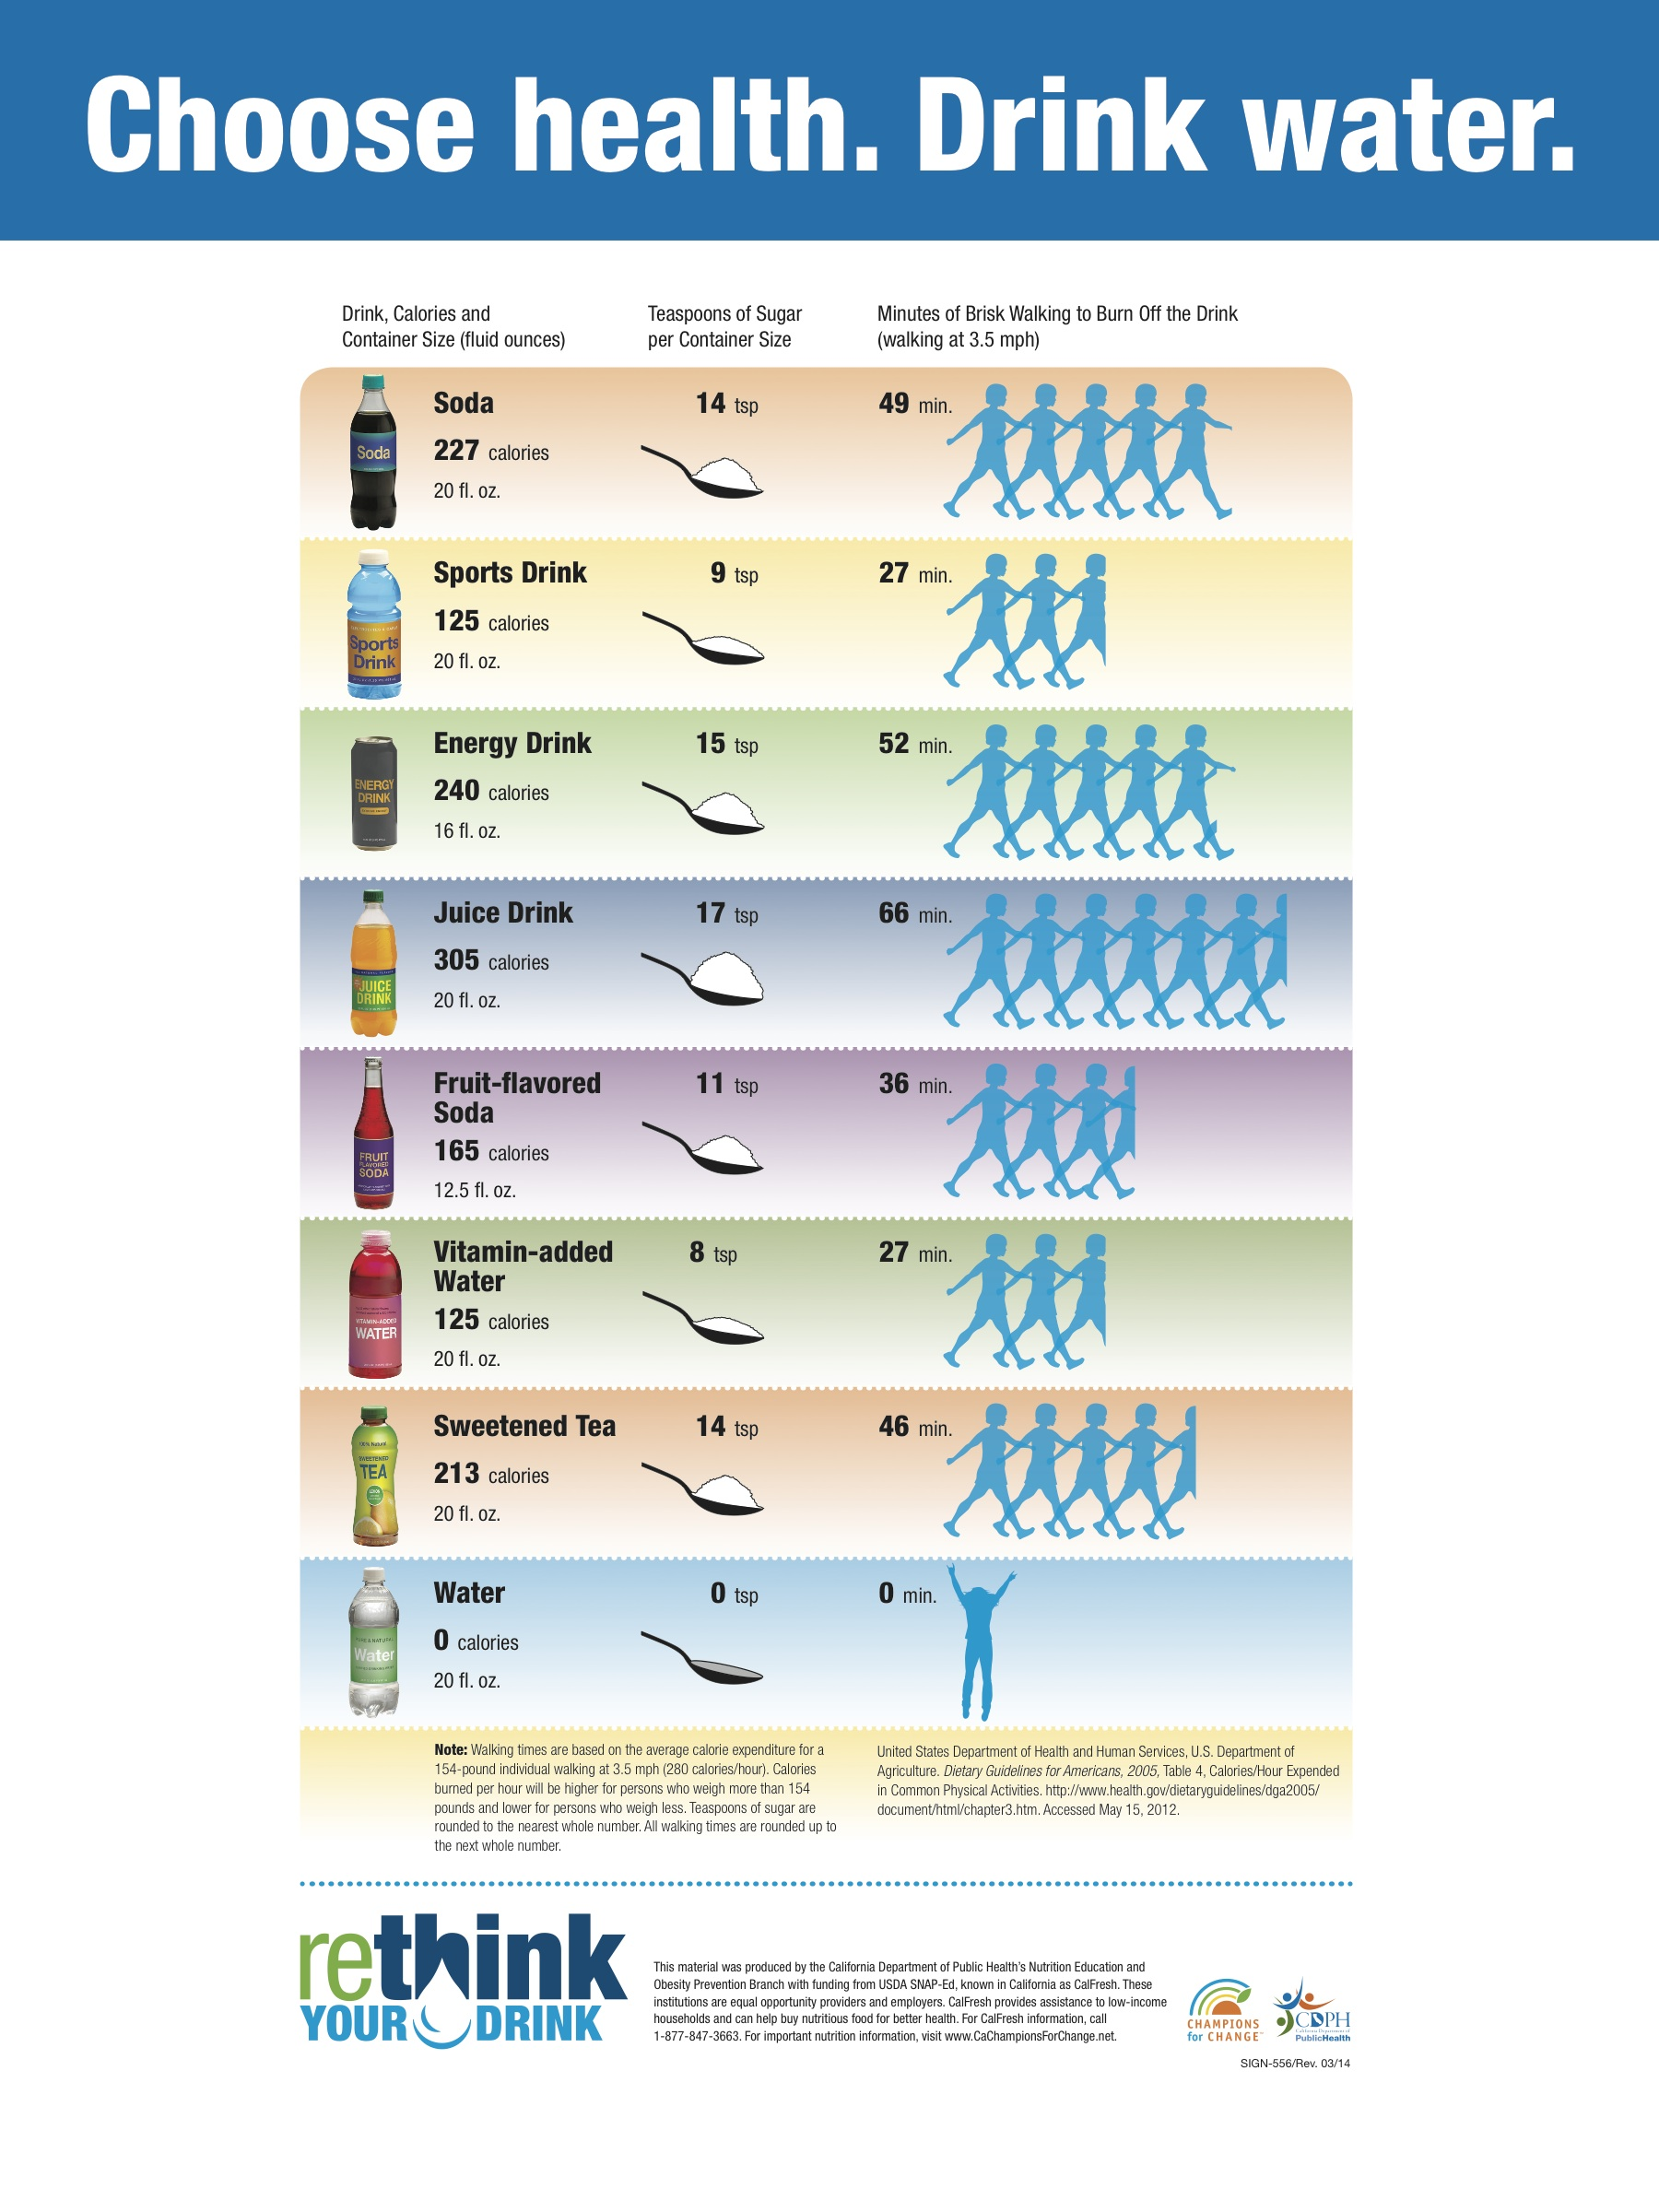 Rethink Your Drink on Natural Resources Worksheet